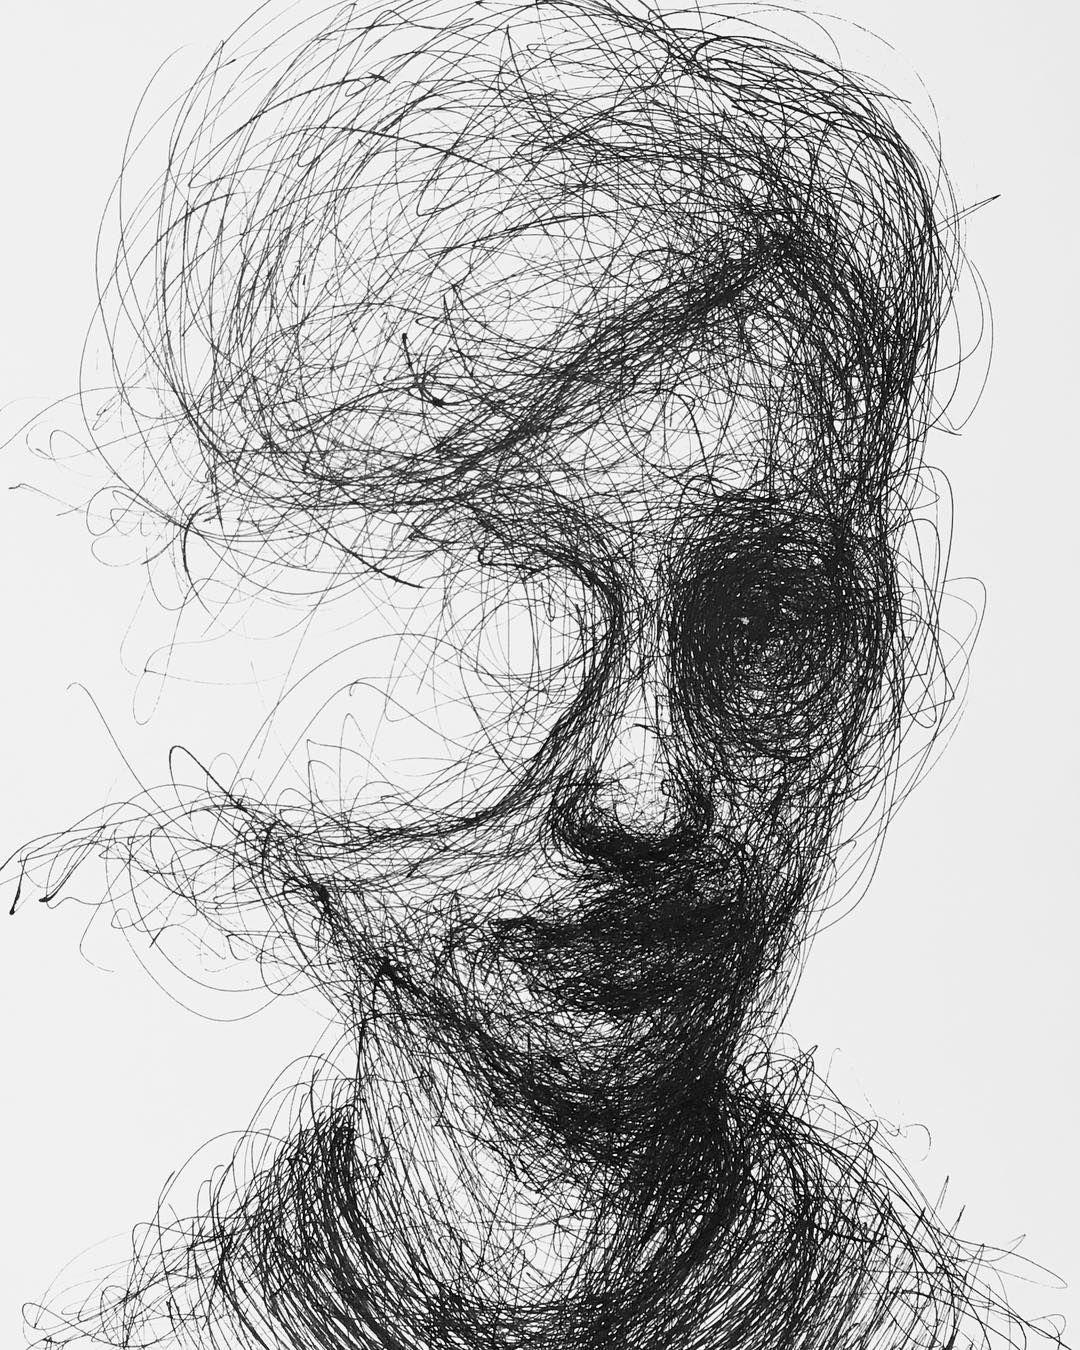 Adam Riches In 2019 Dark Art Drawings Creepy Drawings